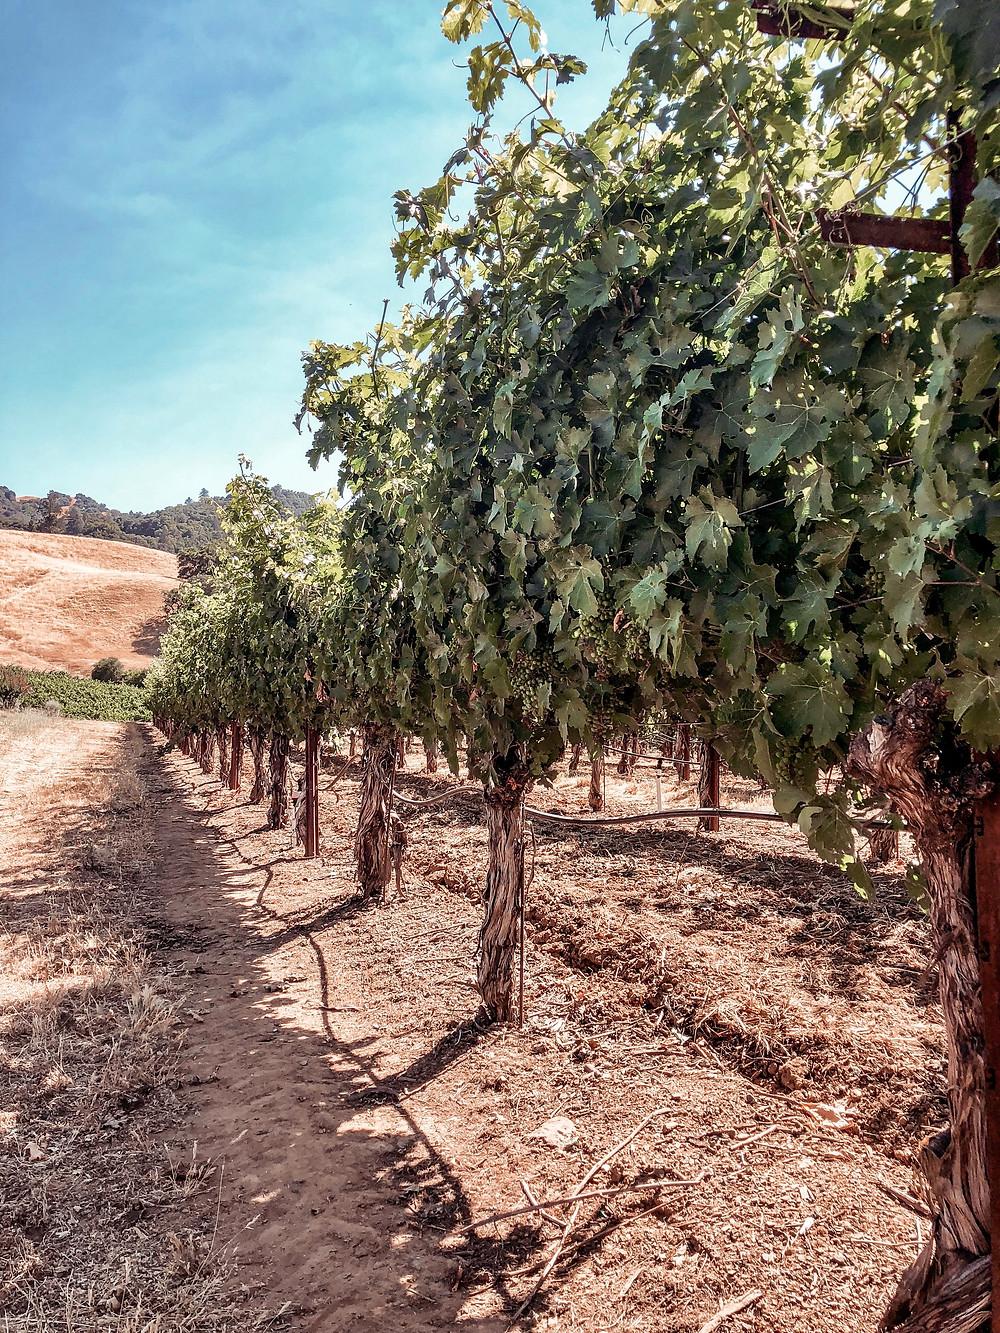 Sonoma Grape Girl, Audra Tavelli, alexander valley, experience alexander valley, sonoma county, sonoma county wine event, healdsburg event, healdsburg wine event, sonoma county blogger, alexander valley wine tasting, alexander valley wineries